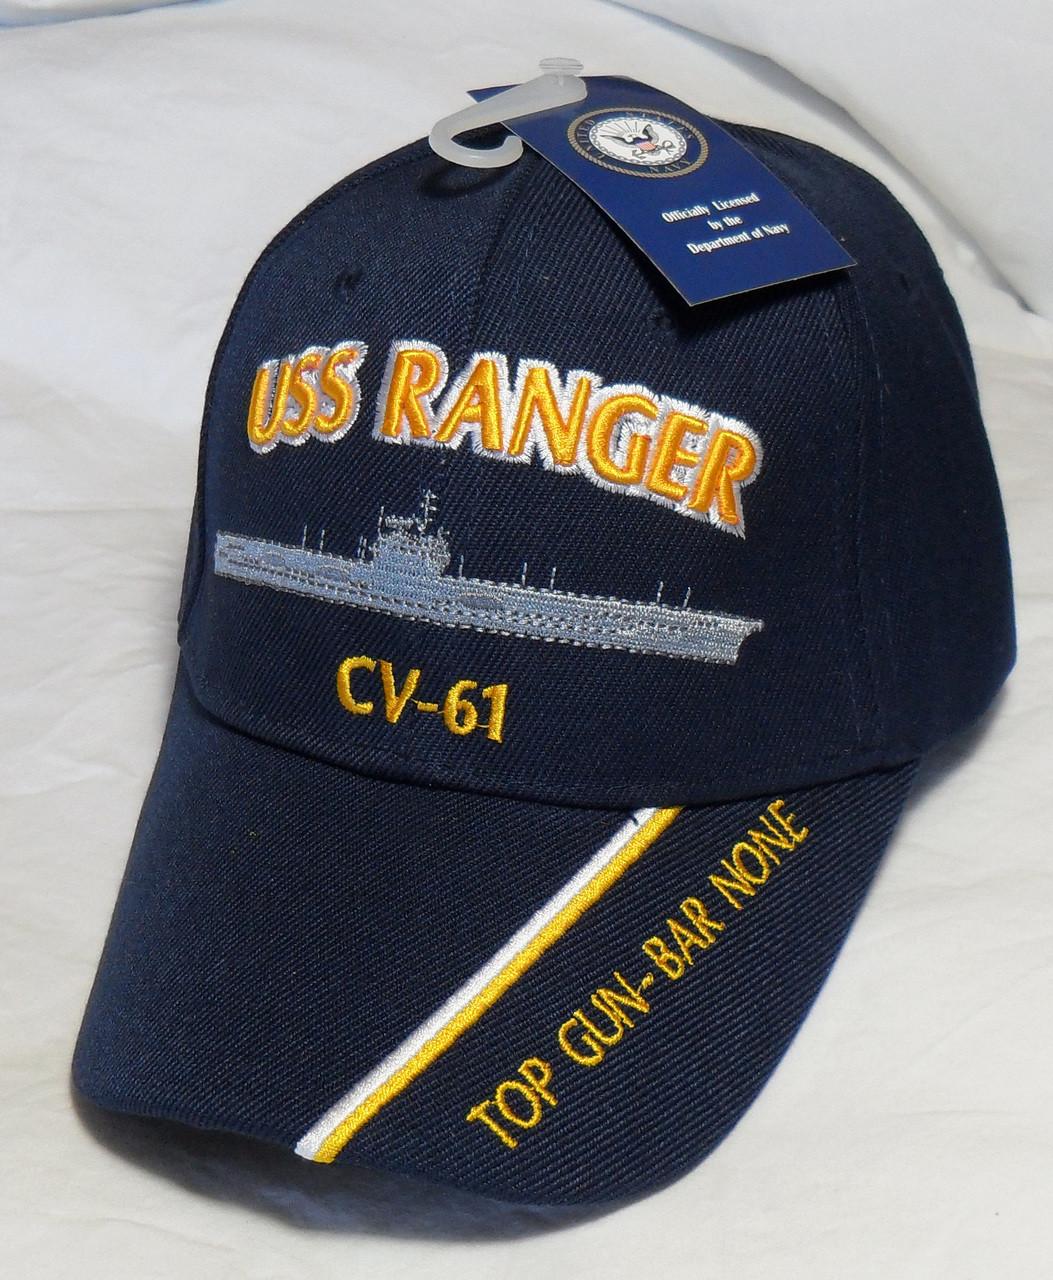 USS Ranger CV-61  Hat Lapel PIN  1 inch metal Pin    US Navy Aircraft carrier